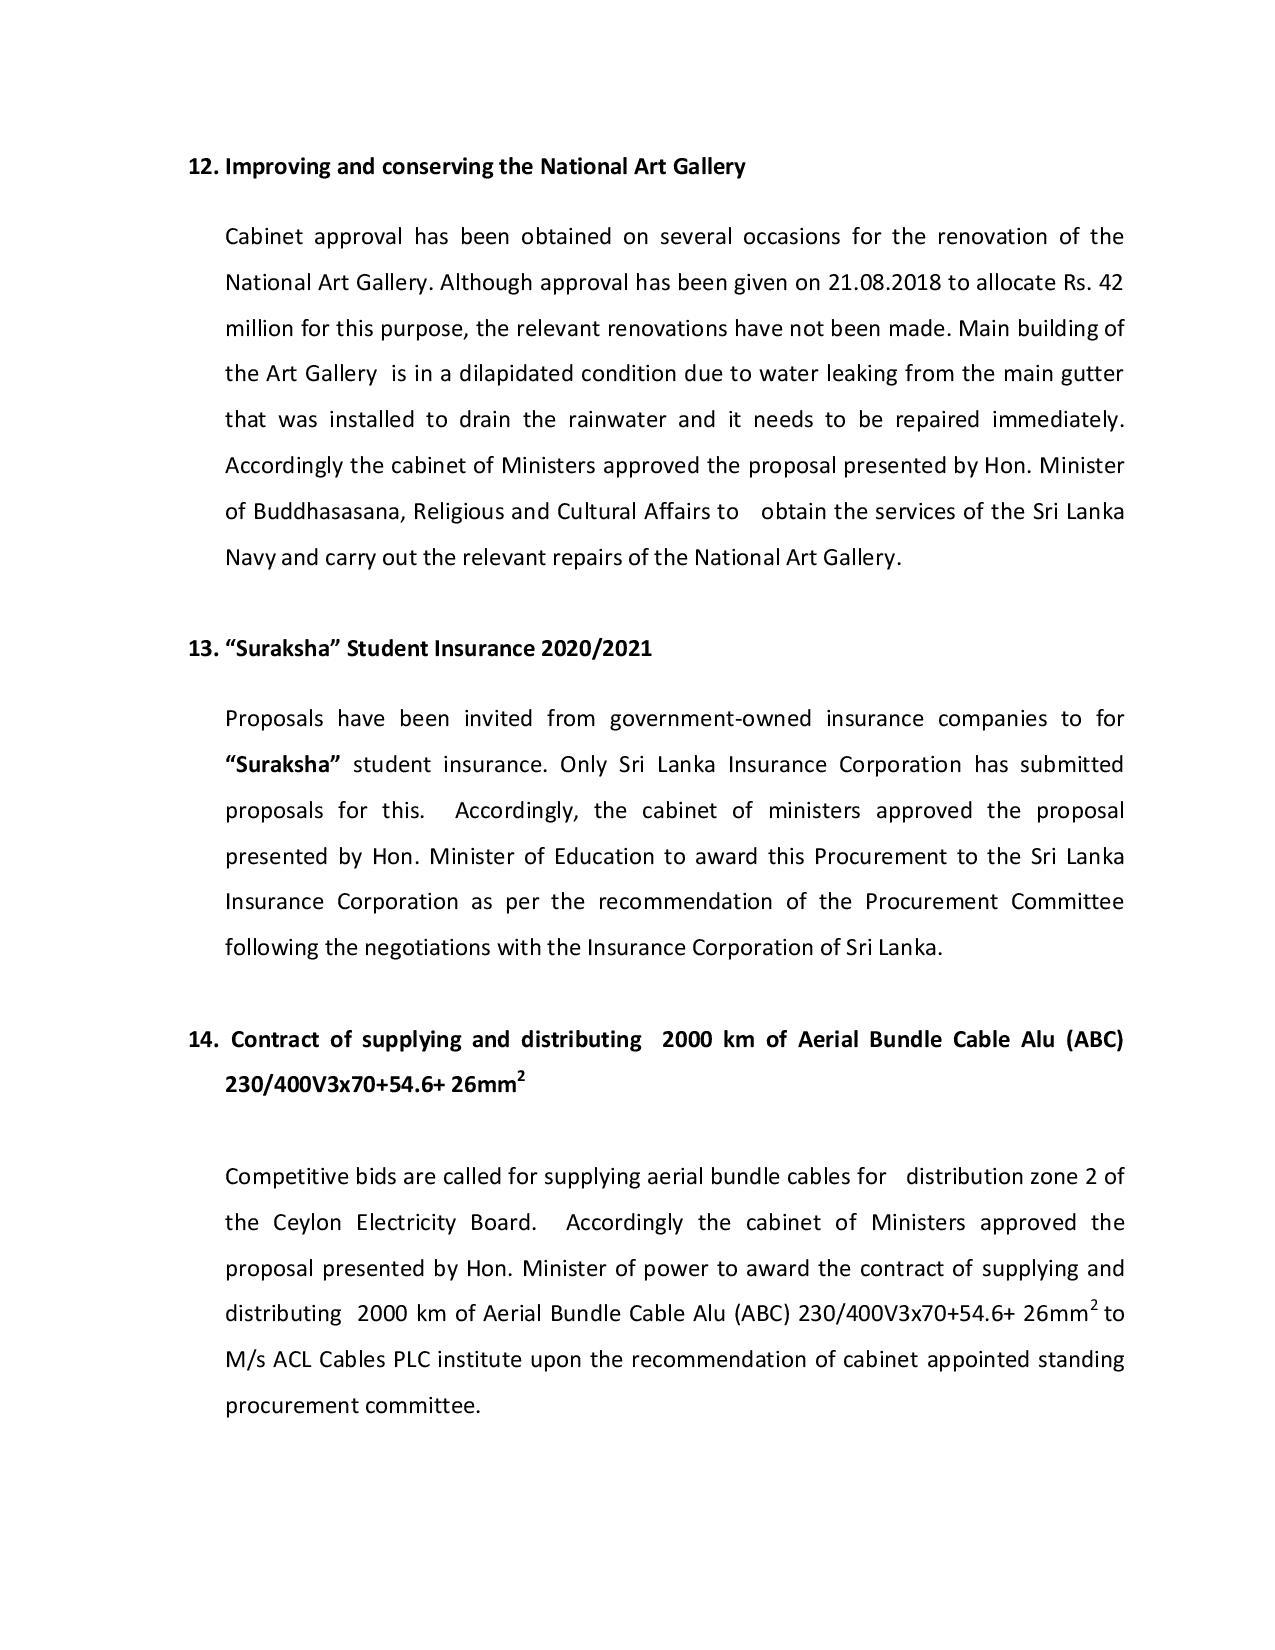 English 02 page 007